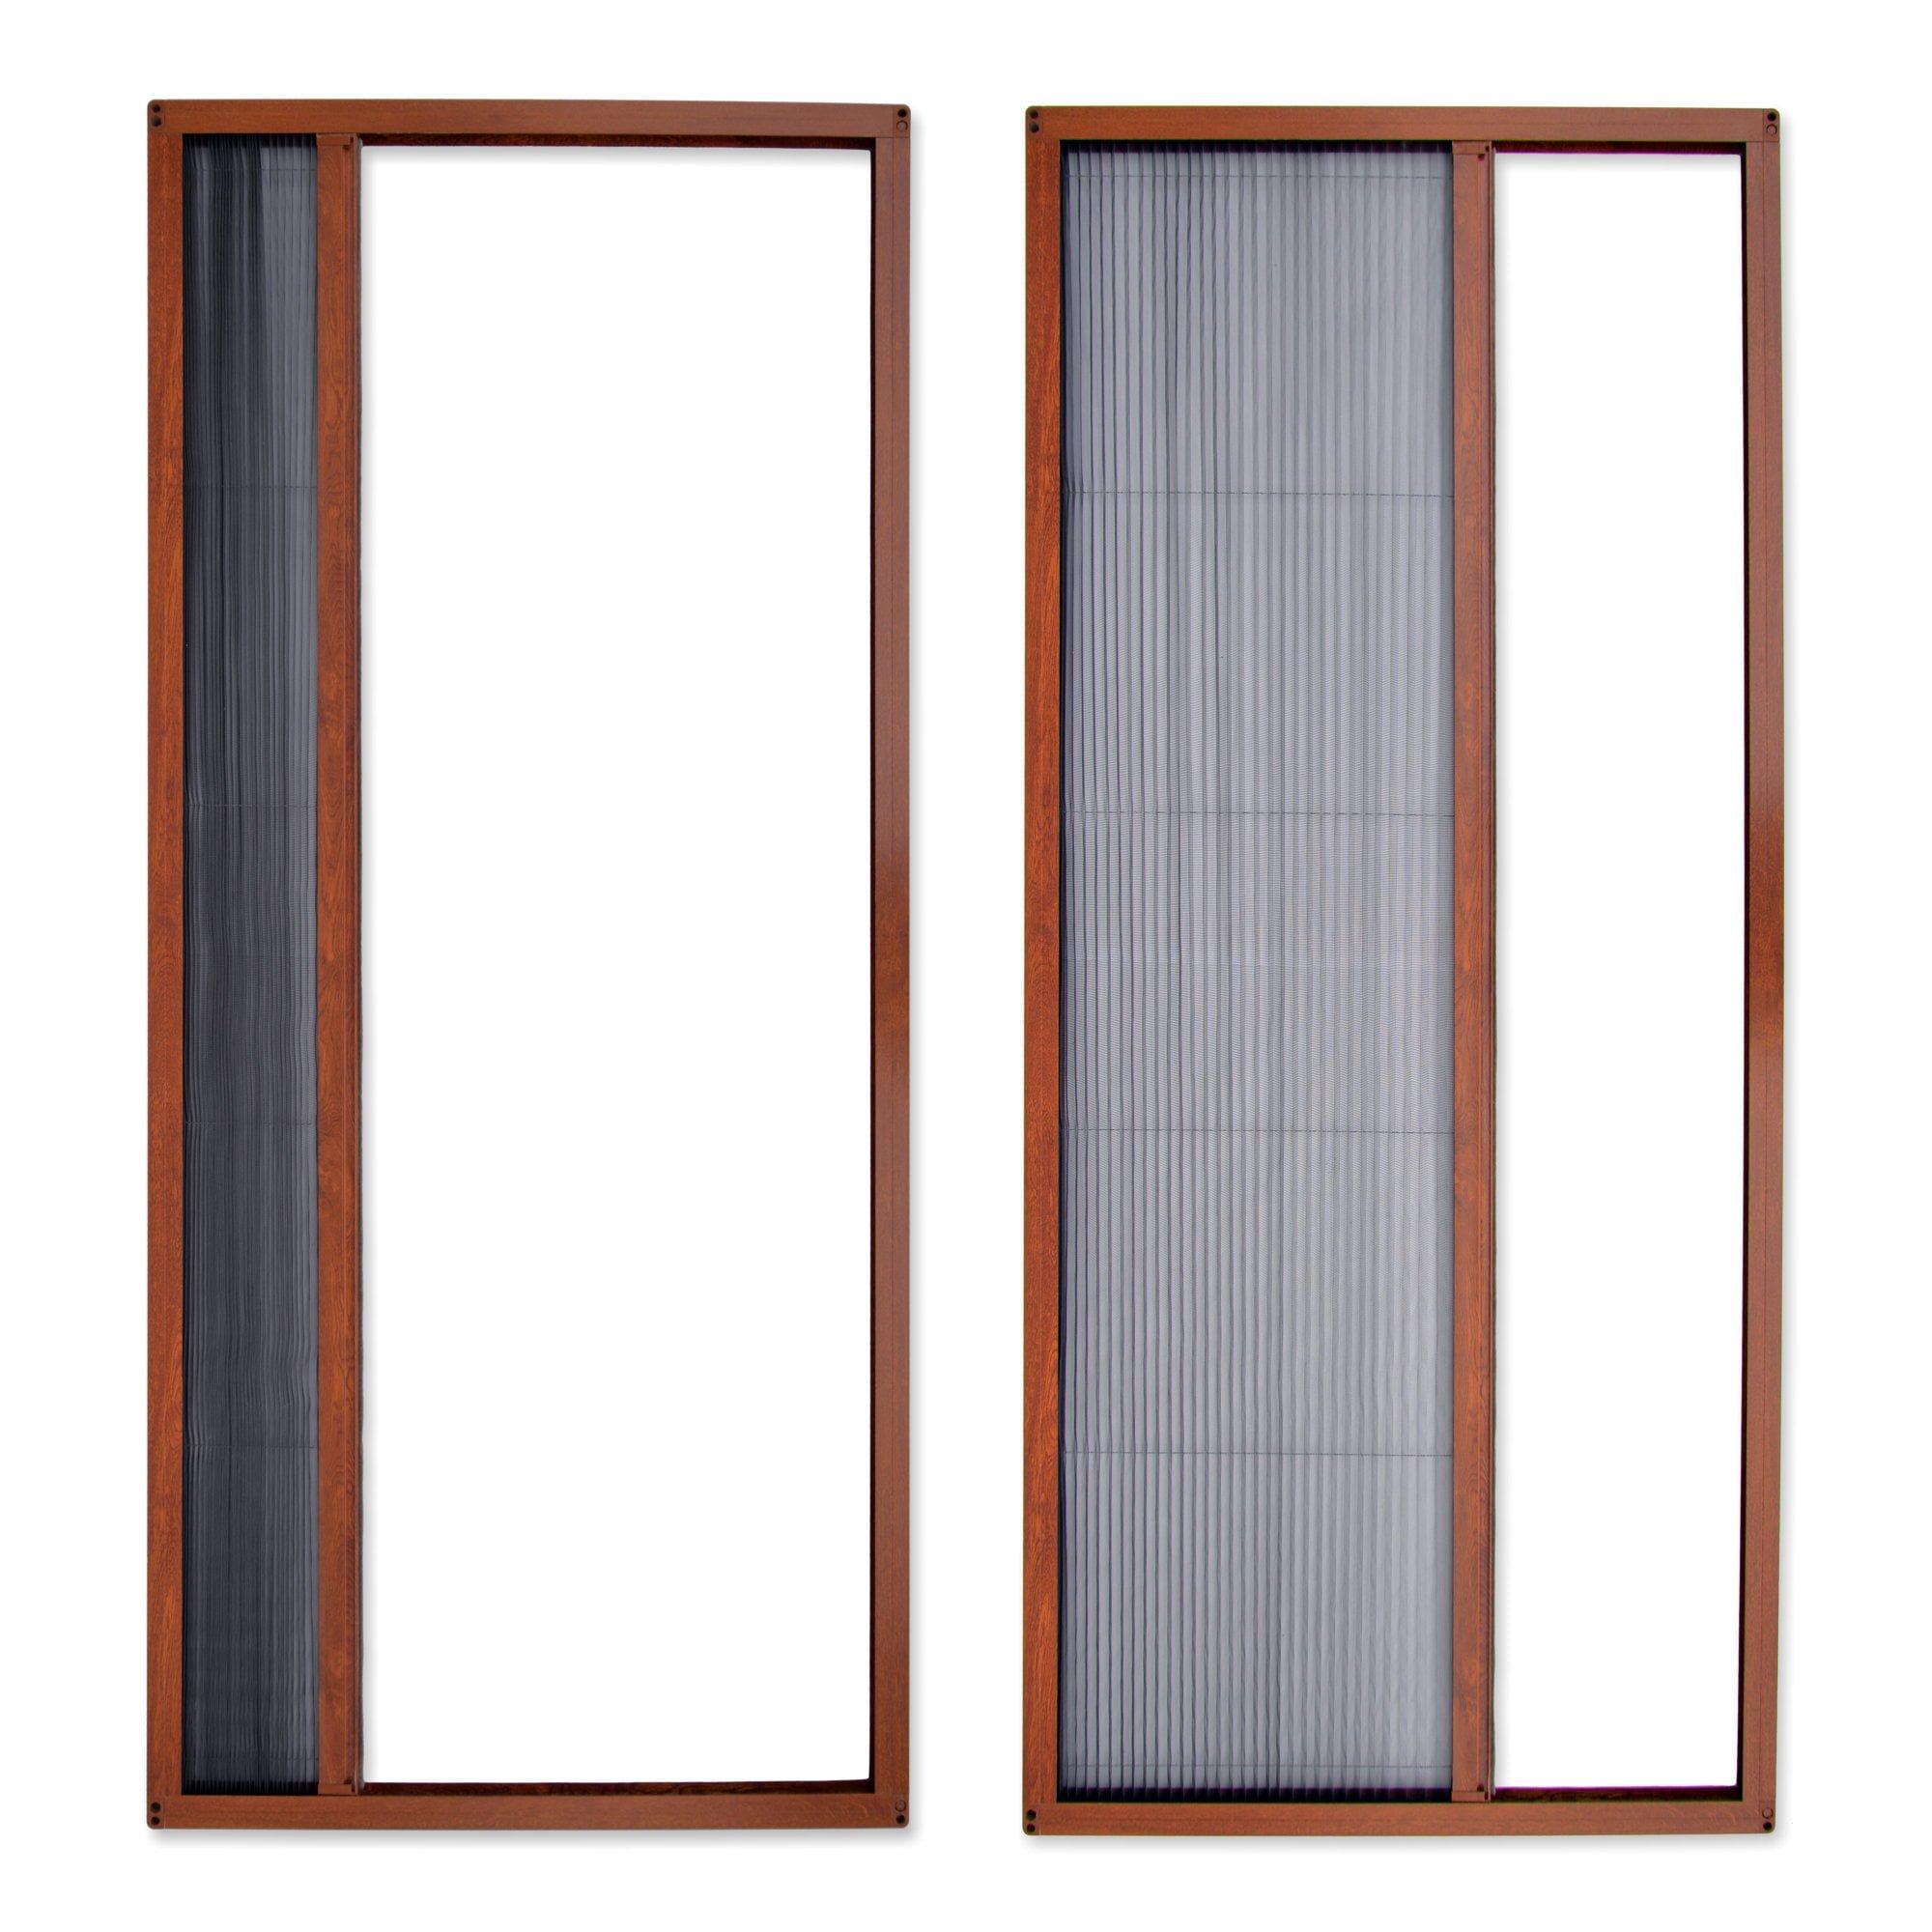 Sineklik - Efor Cam & Ayna